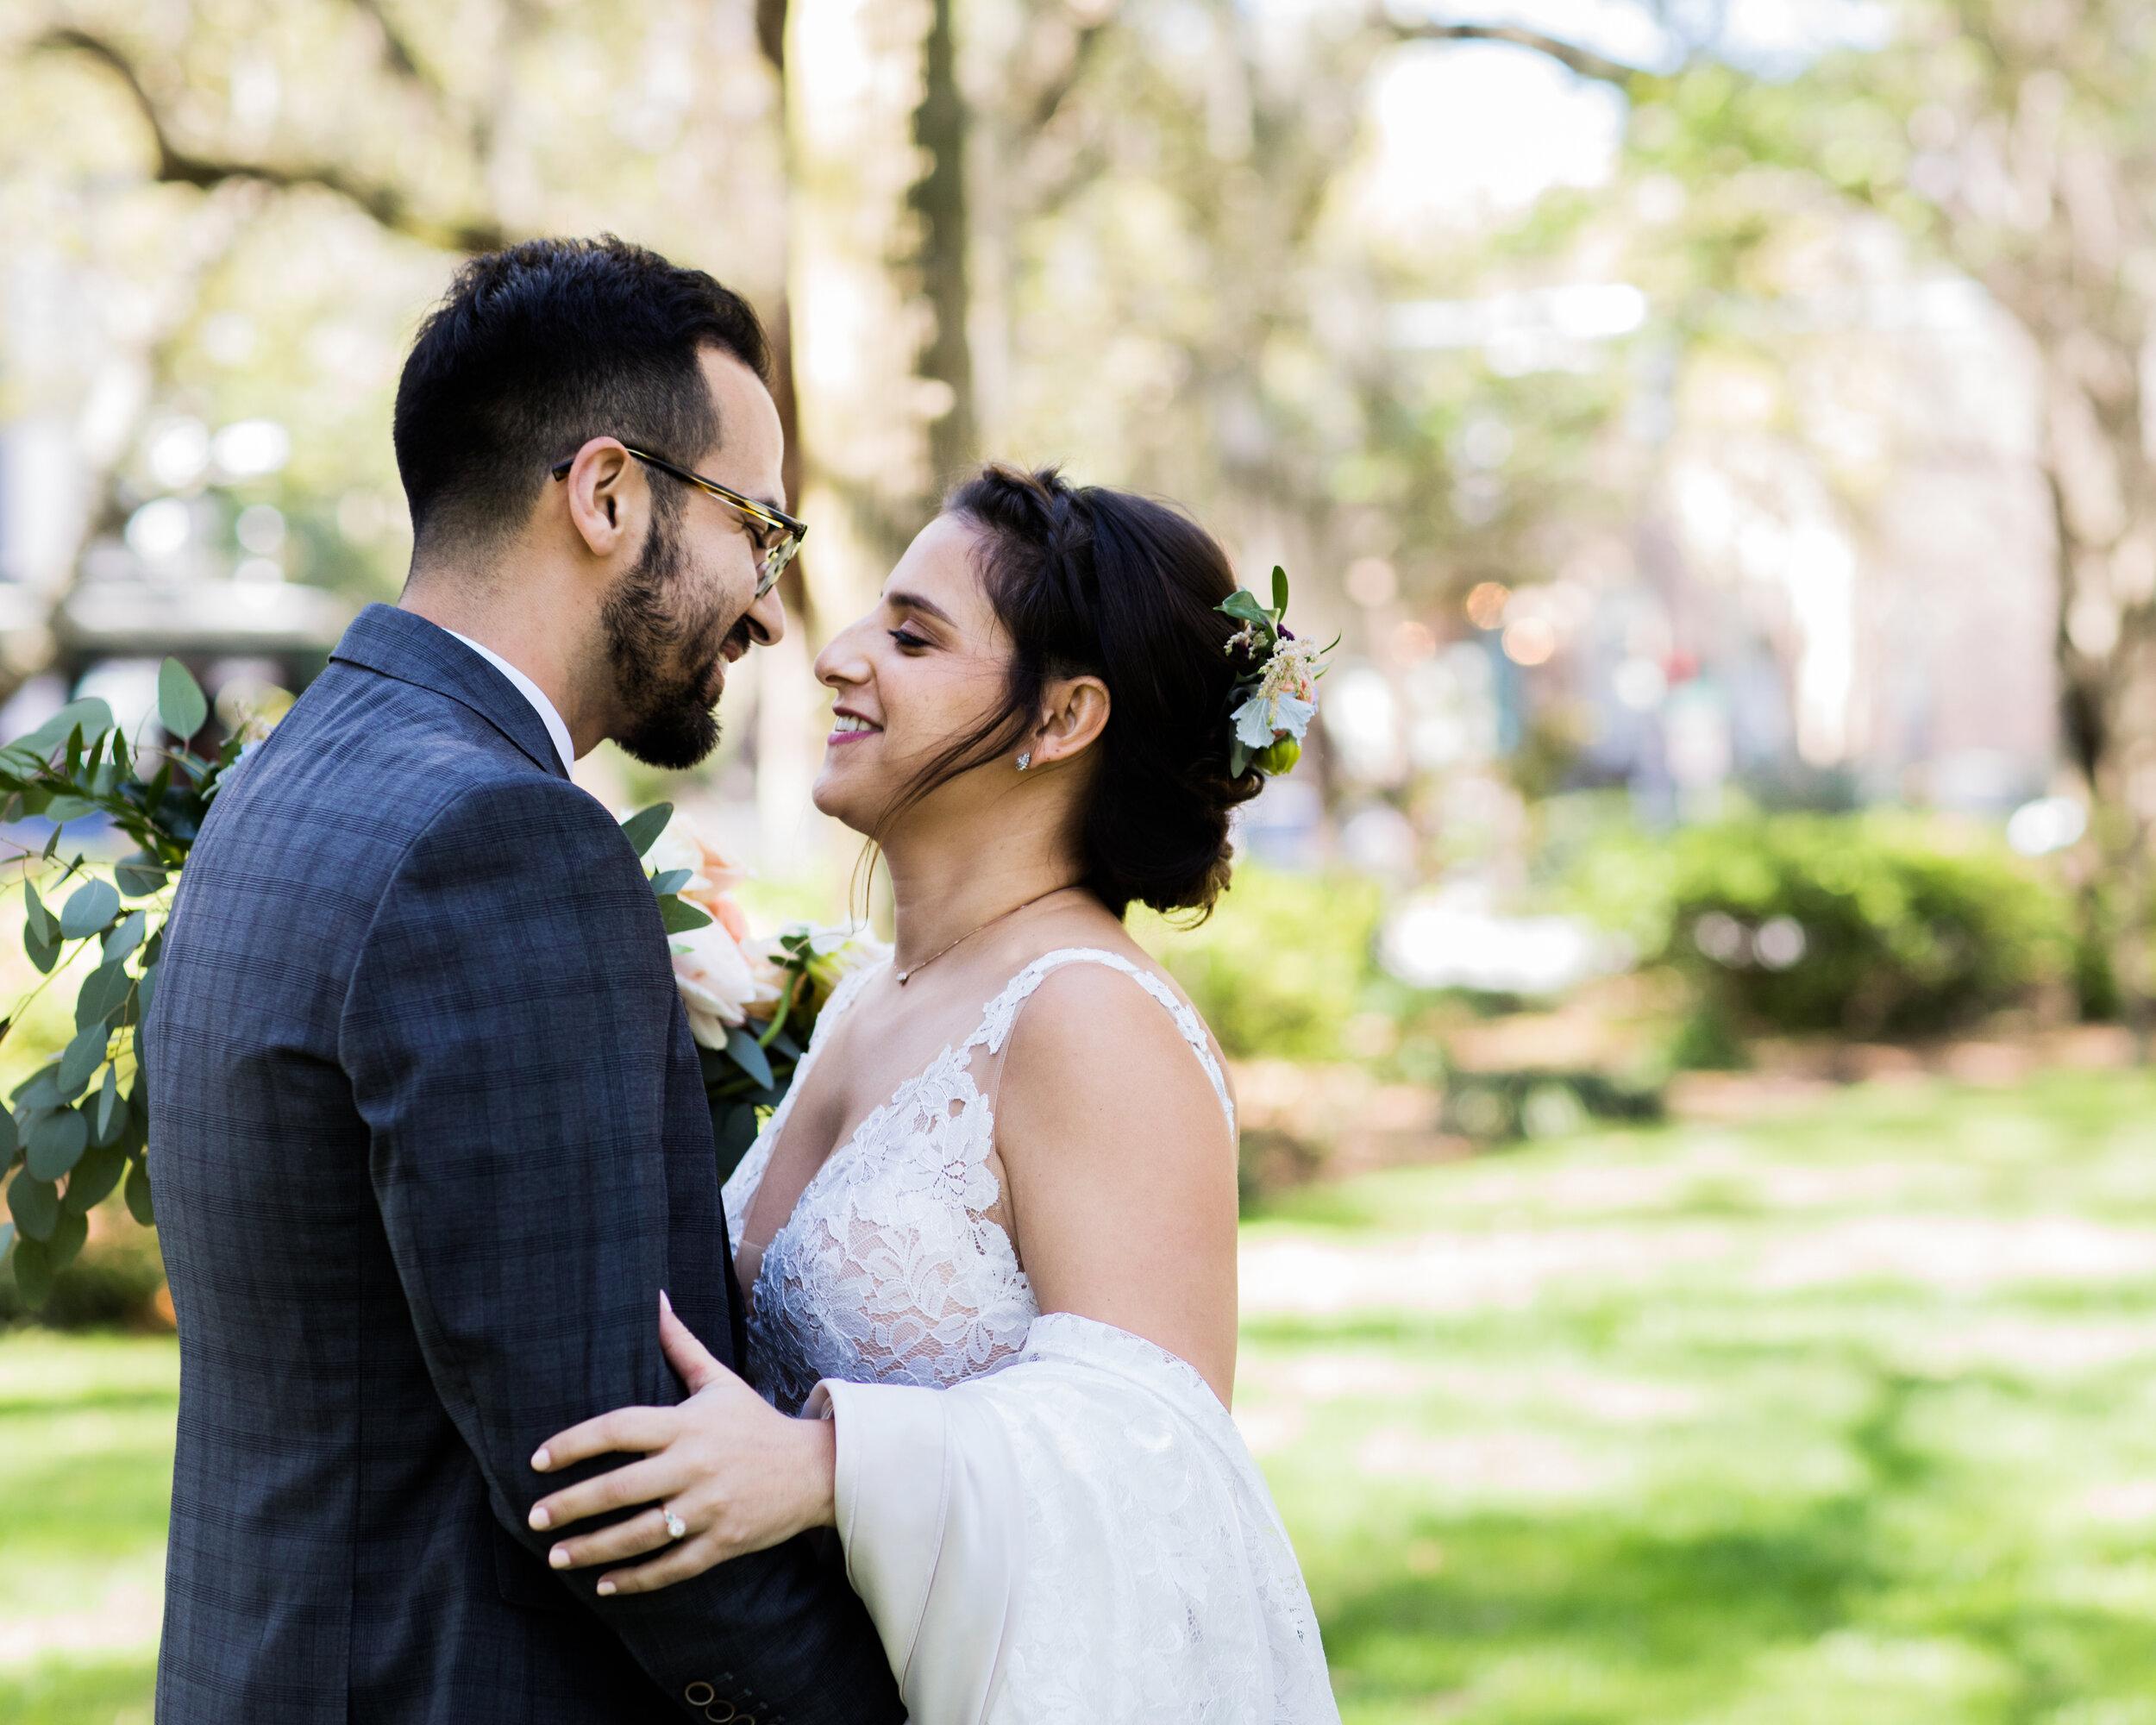 ivory-and-beau-blog-weddings-ivory-and-beau-couple-dominique-and-andres-savannah-florist-wedding-planning-savannah-bridal-boutique-wedding-flowers-KIP_WEBERWEDDING_RAILROADMUSEUM-364.JPG